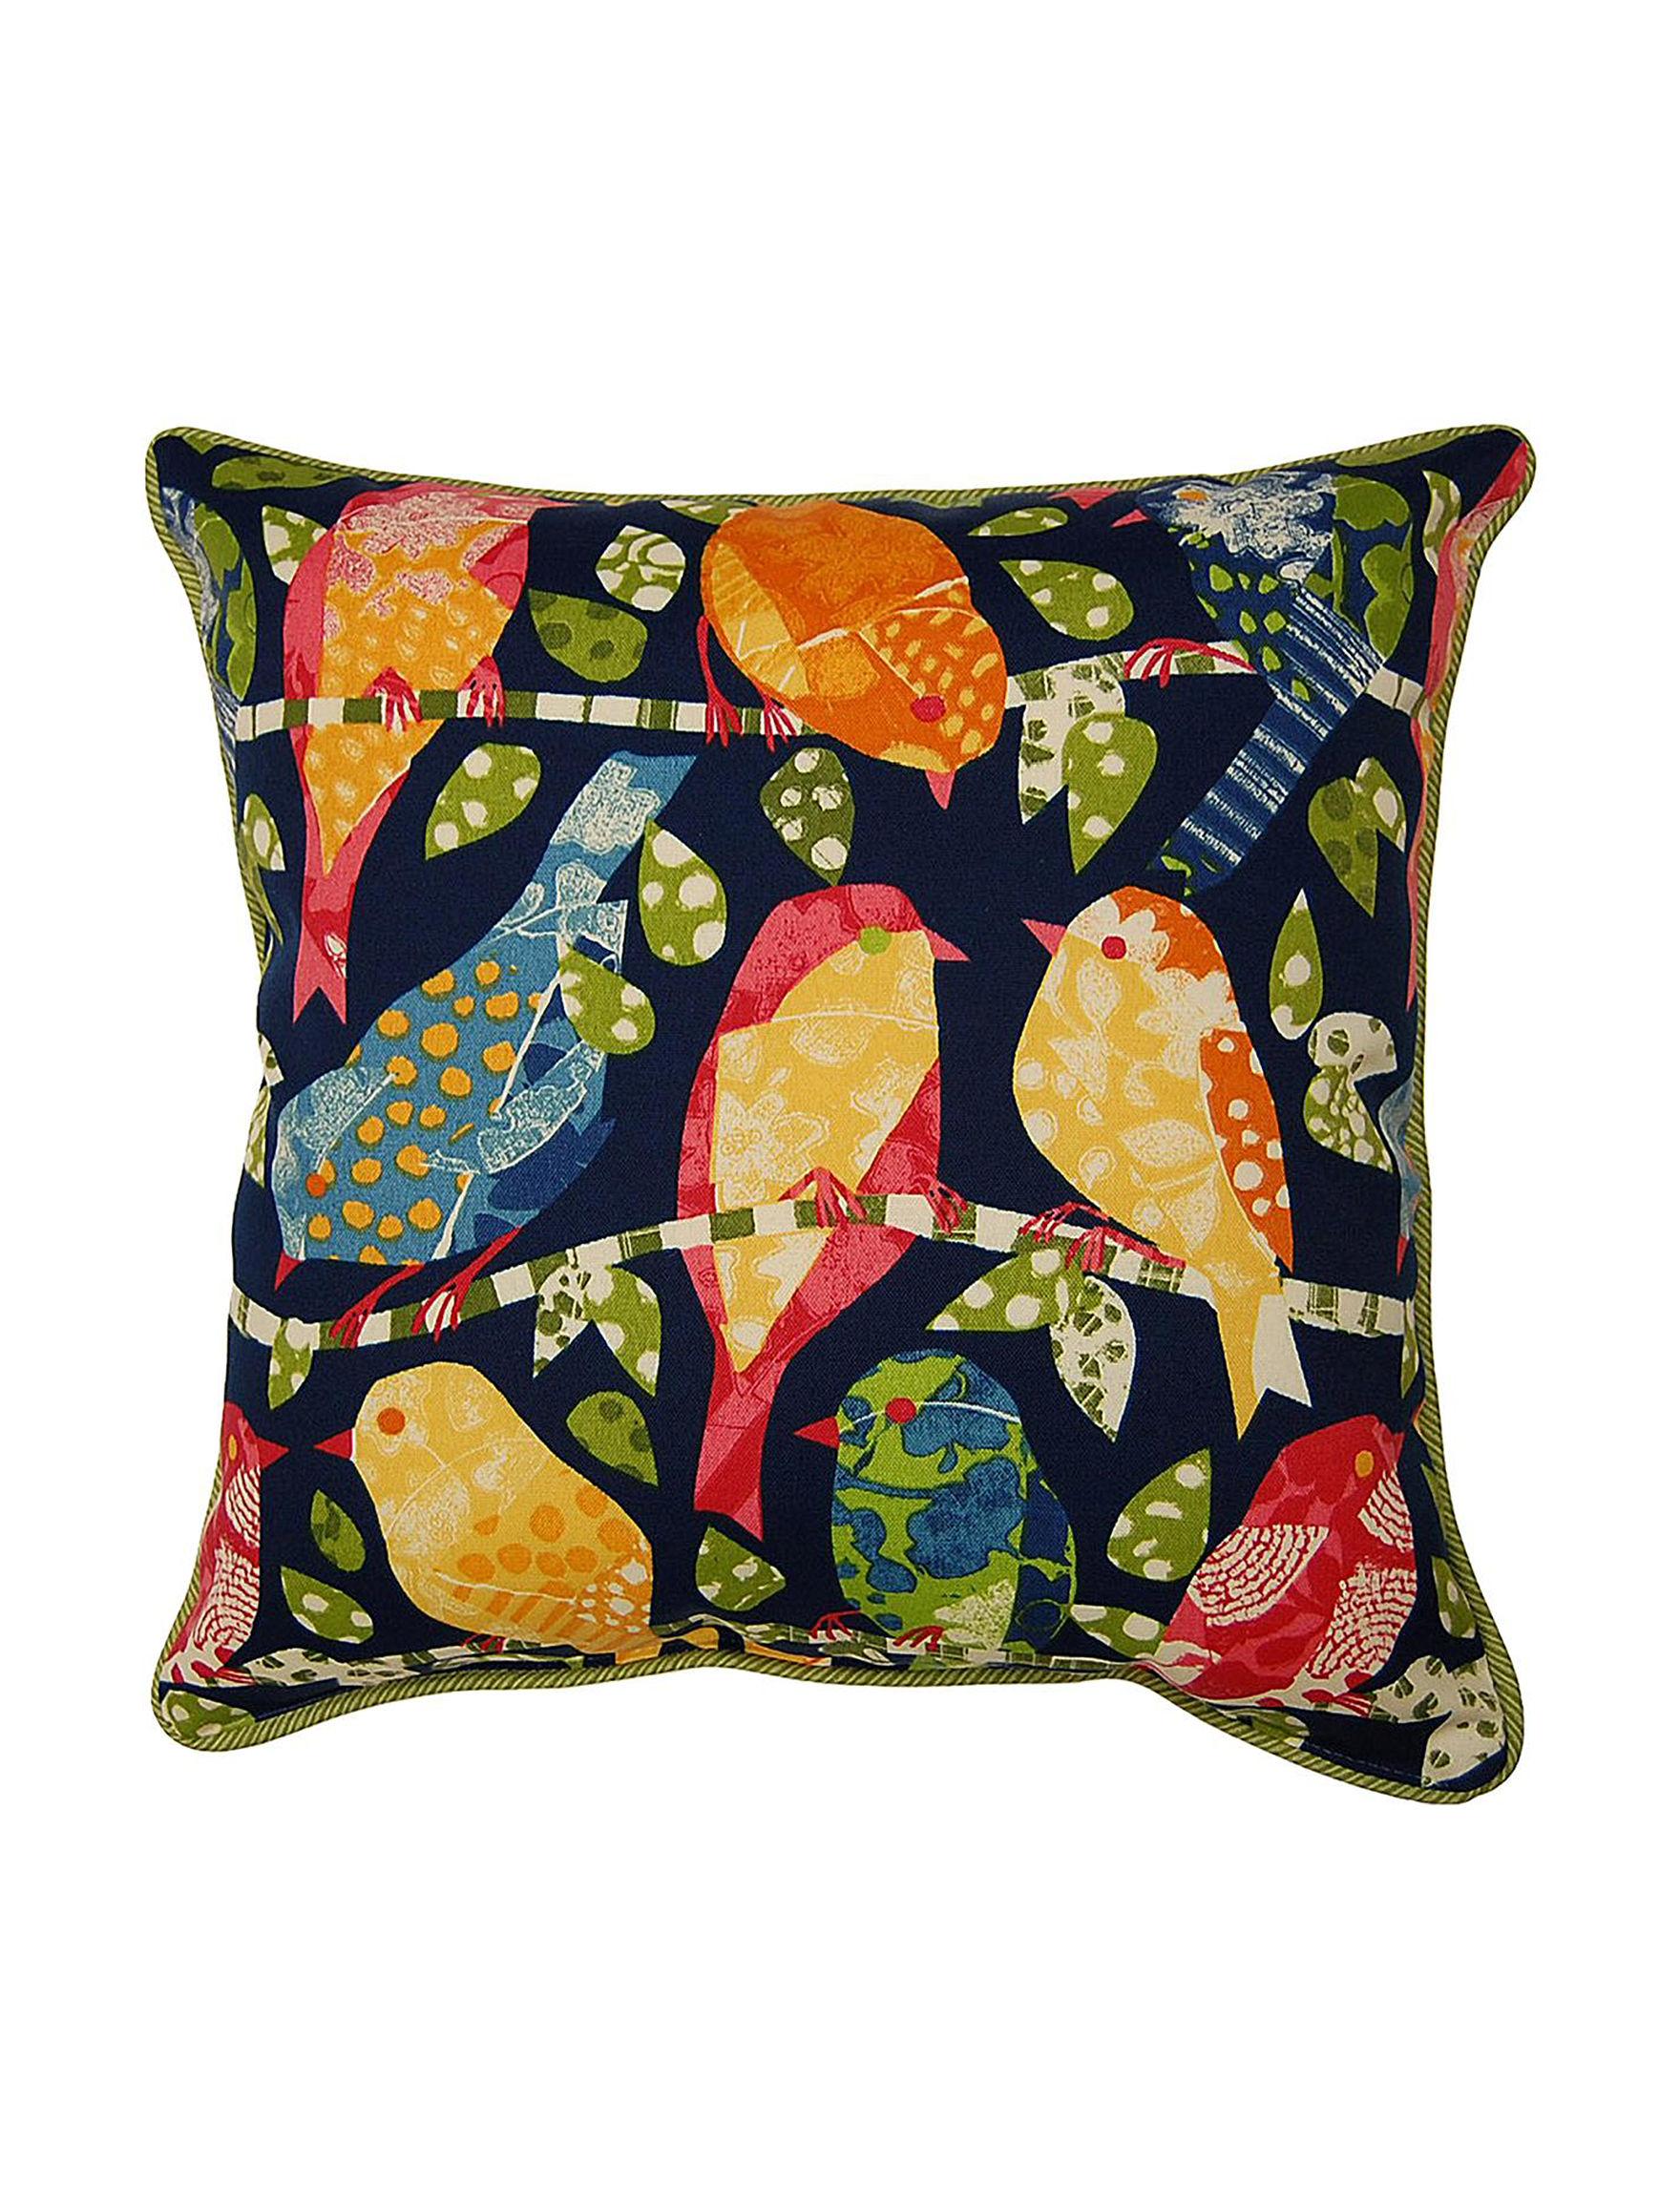 Creative Home Furnishings Black / Multi Decorative Pillows